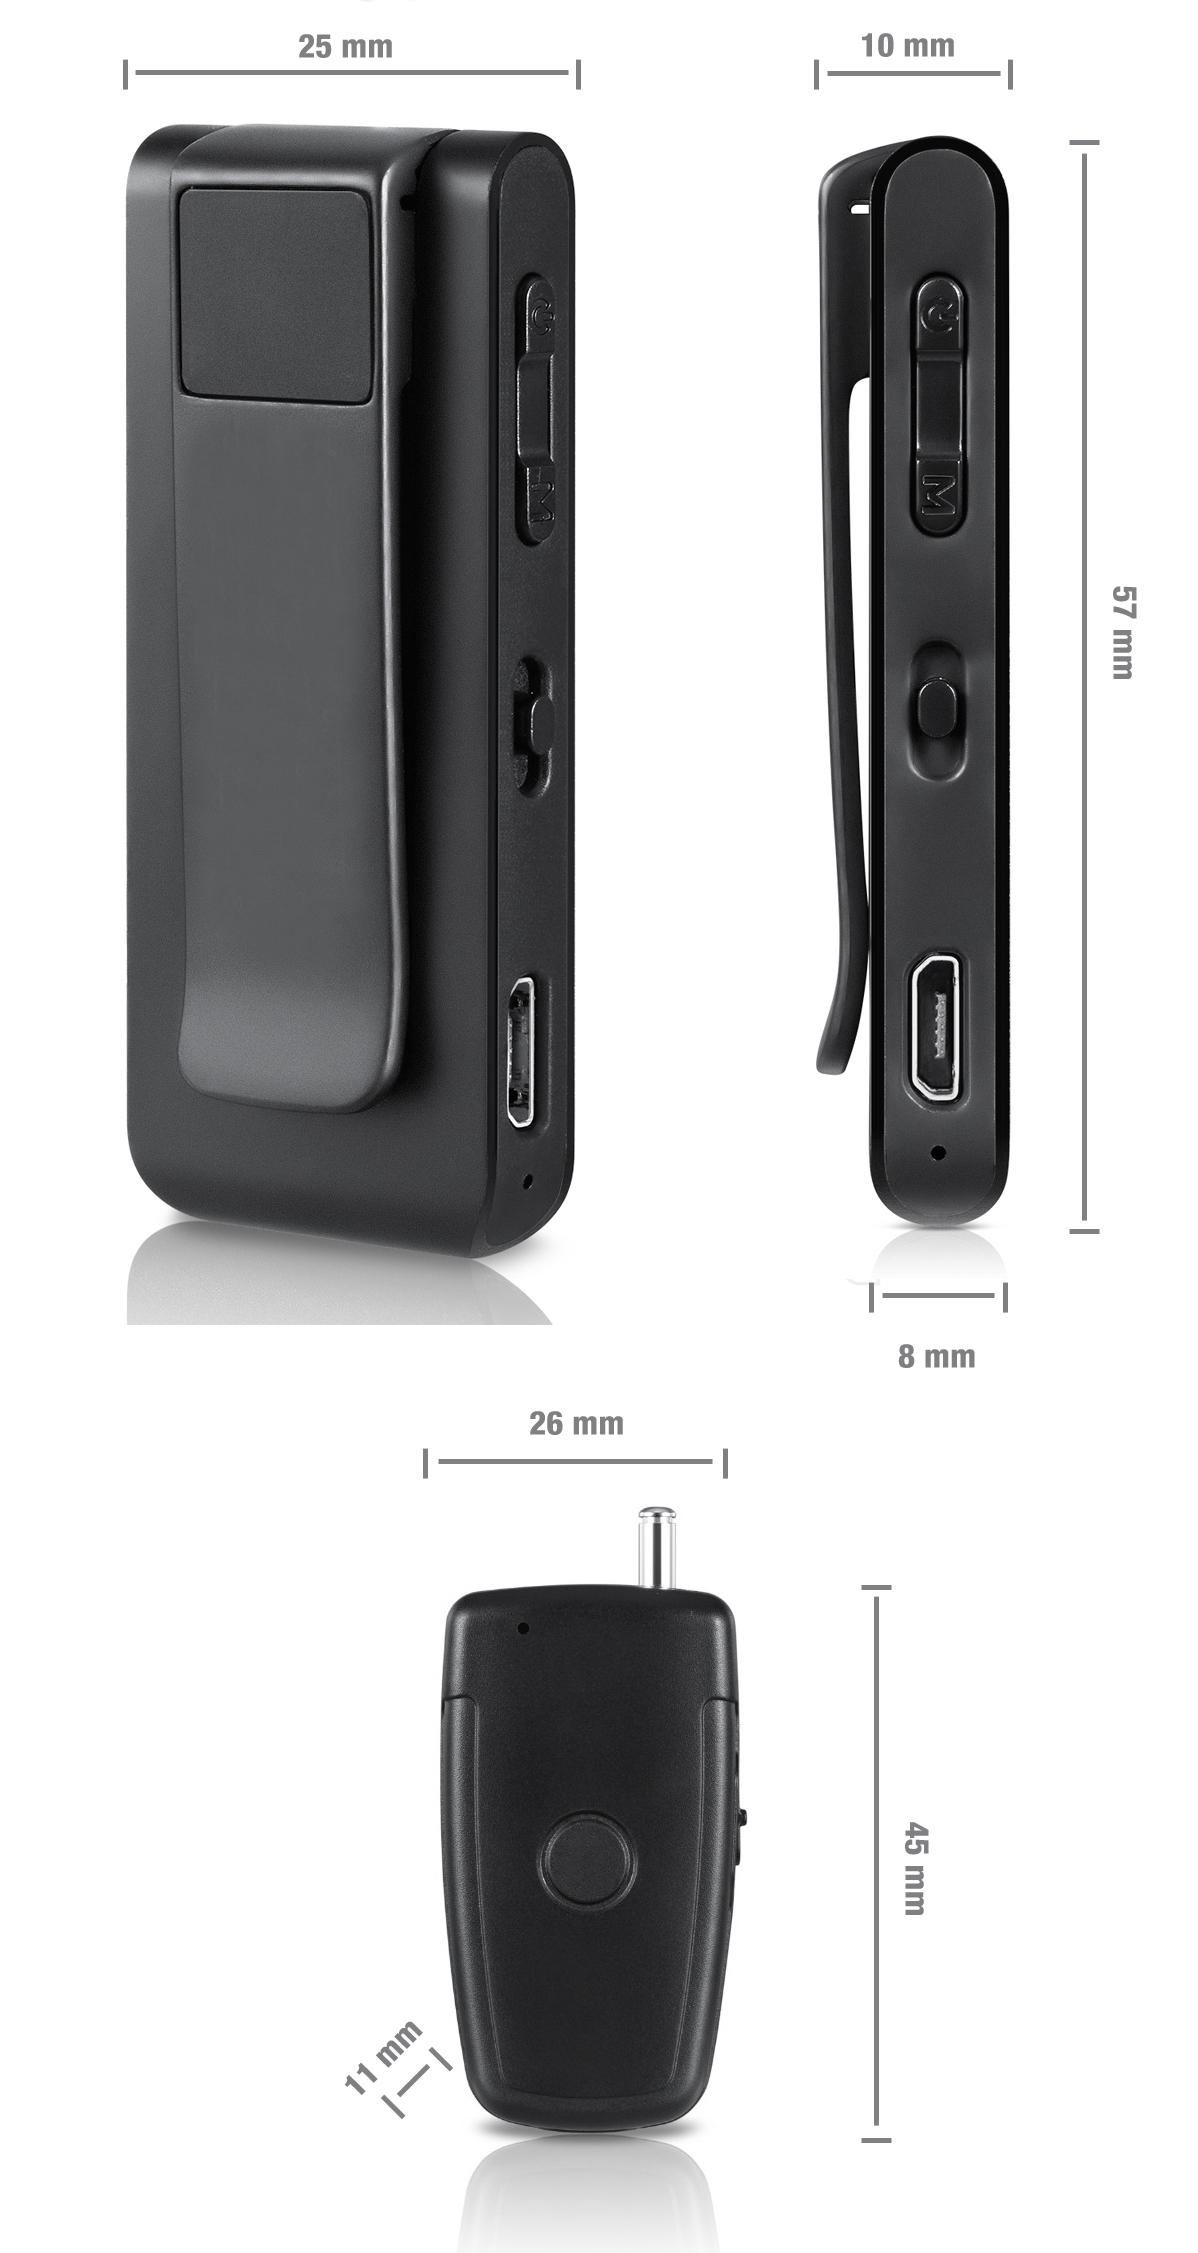 PROFESJONALNY DYKTAFON PODSŁUCH VOX 16GB +MIKROFON Kod producenta DVR-309